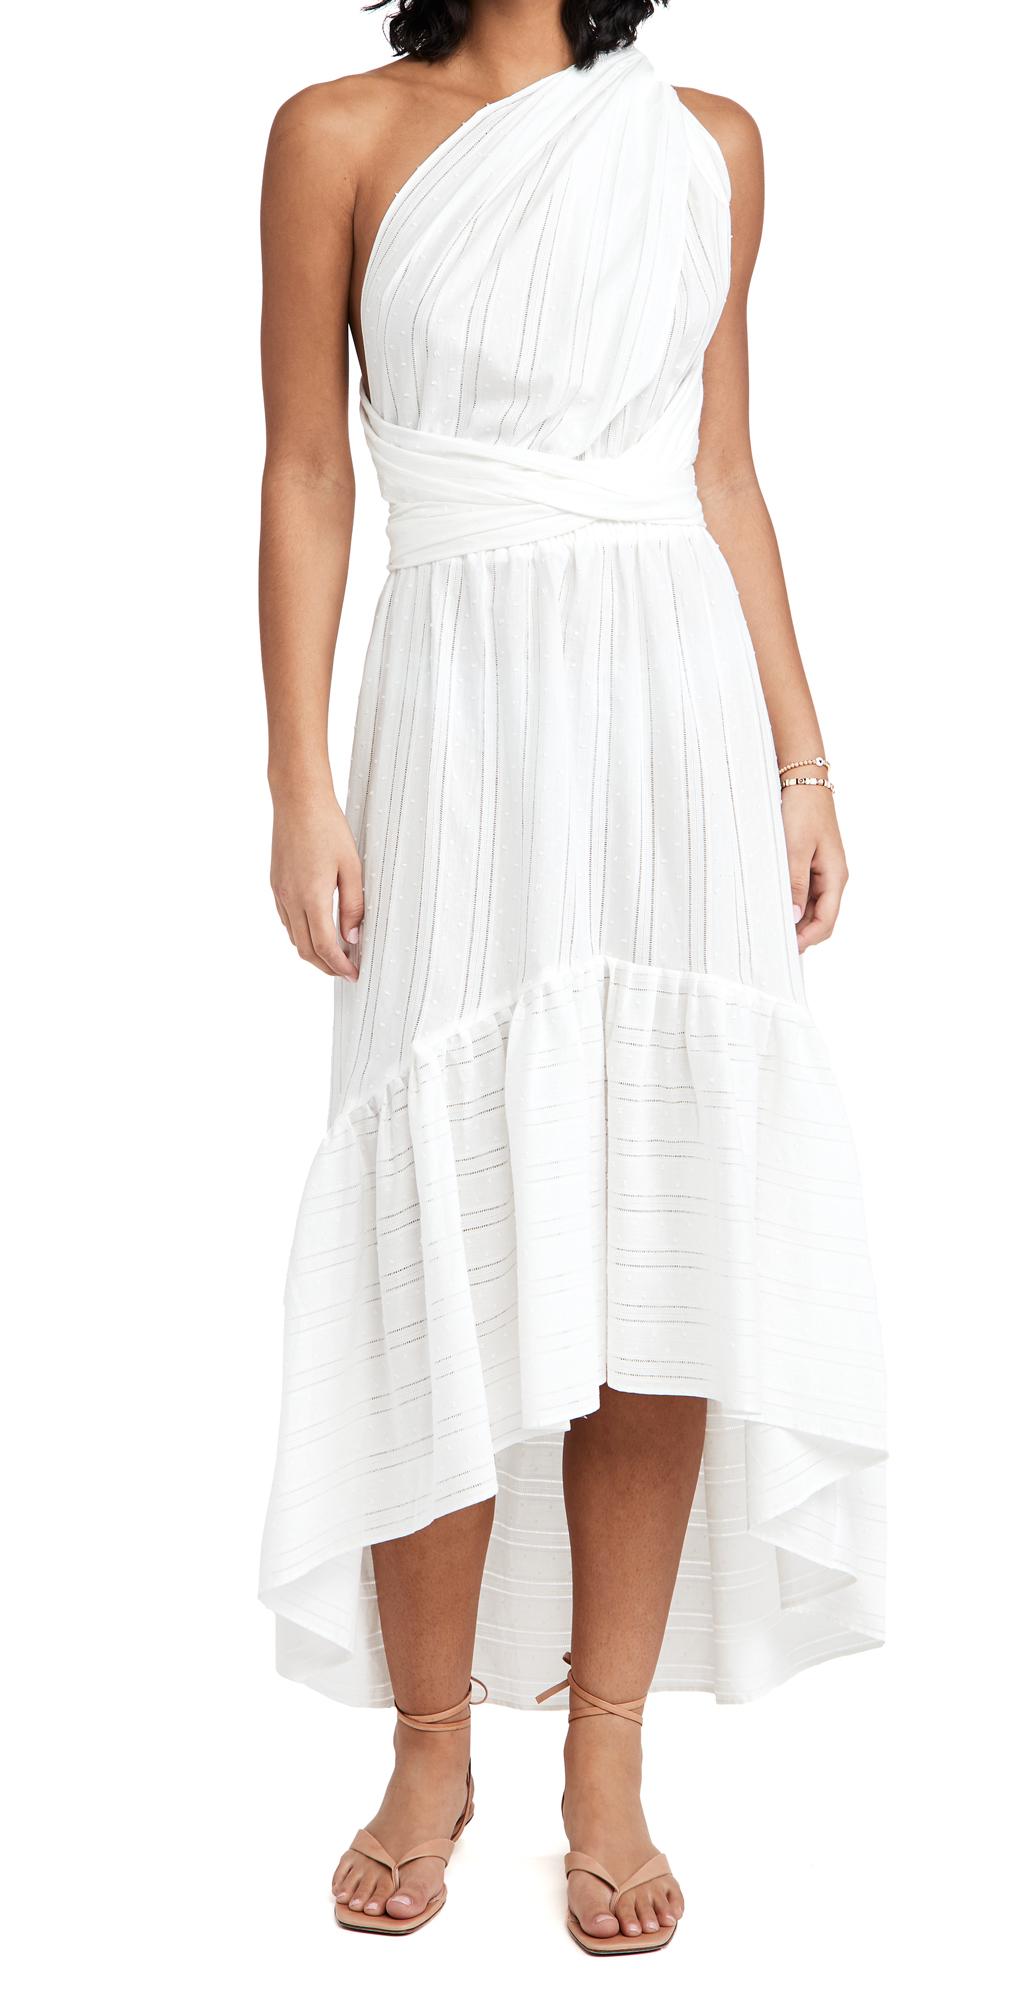 Uda Dress